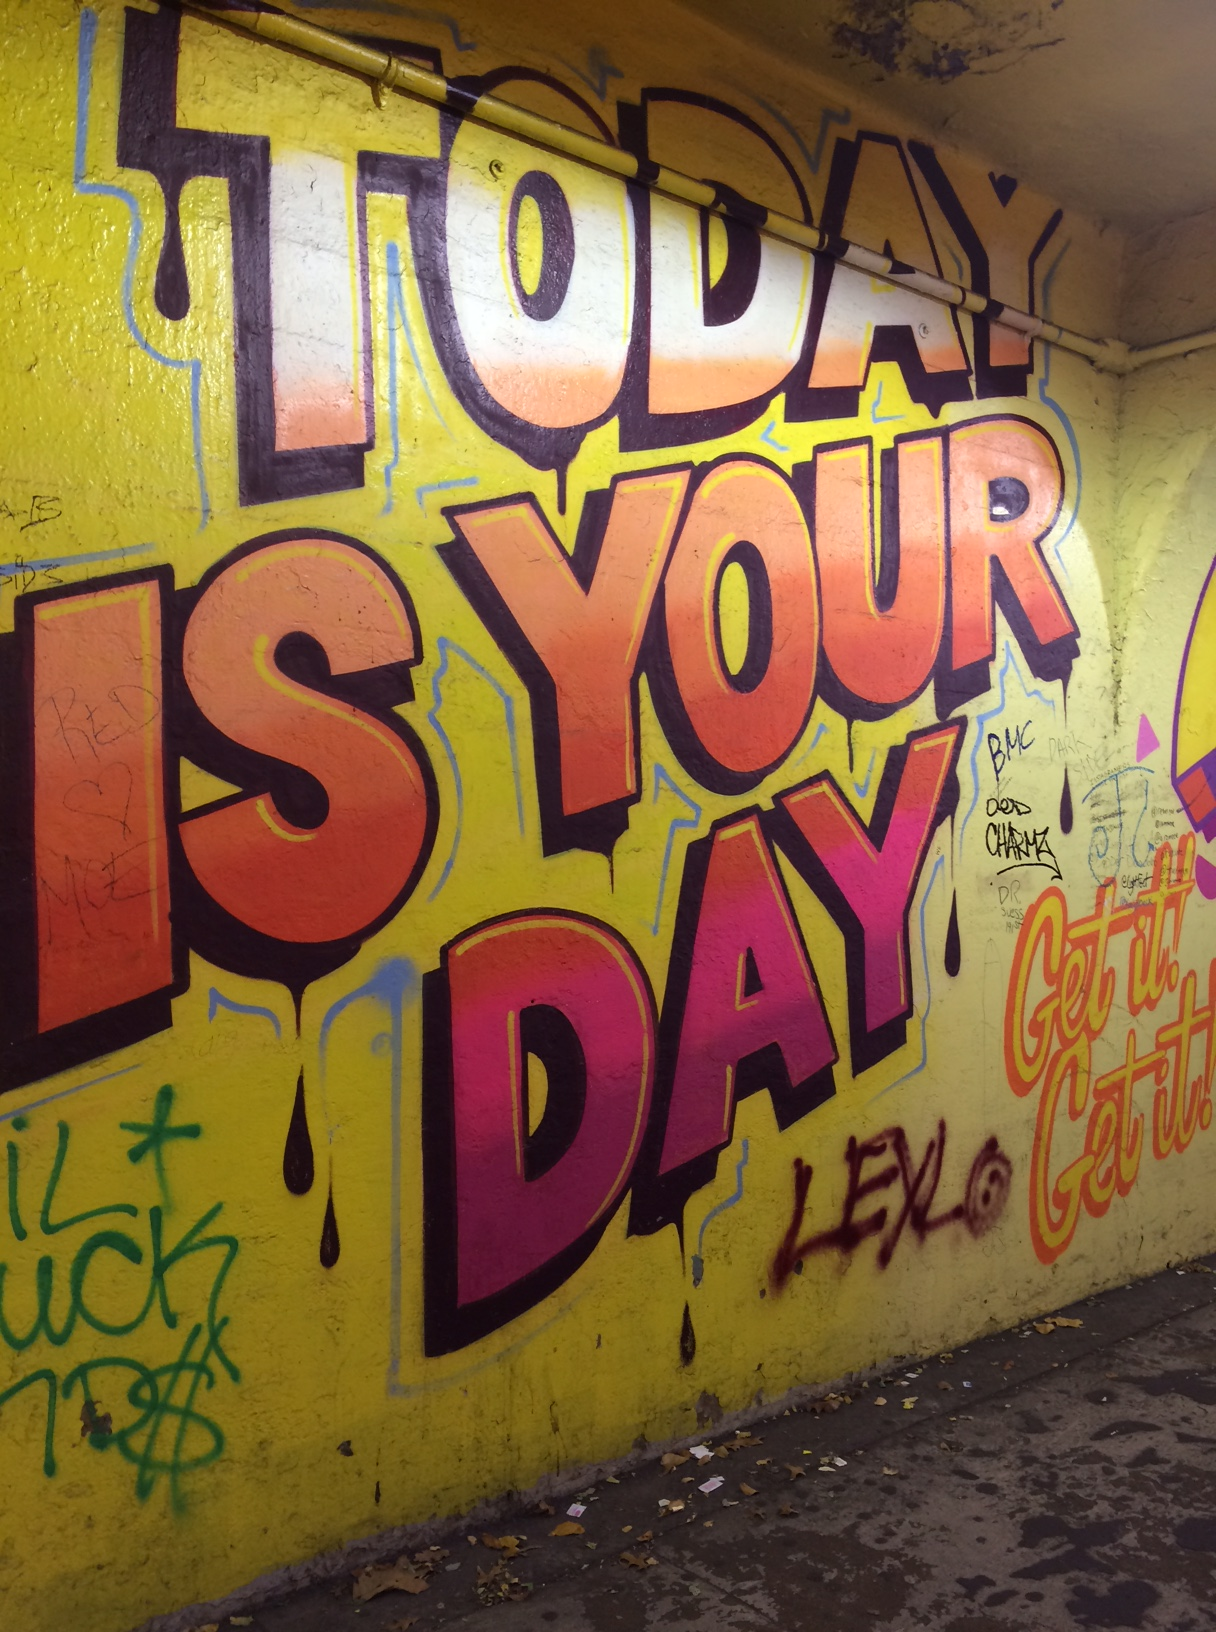 Gorgeous Street Art  I Came Across in the 191st St. SubwayTunnel